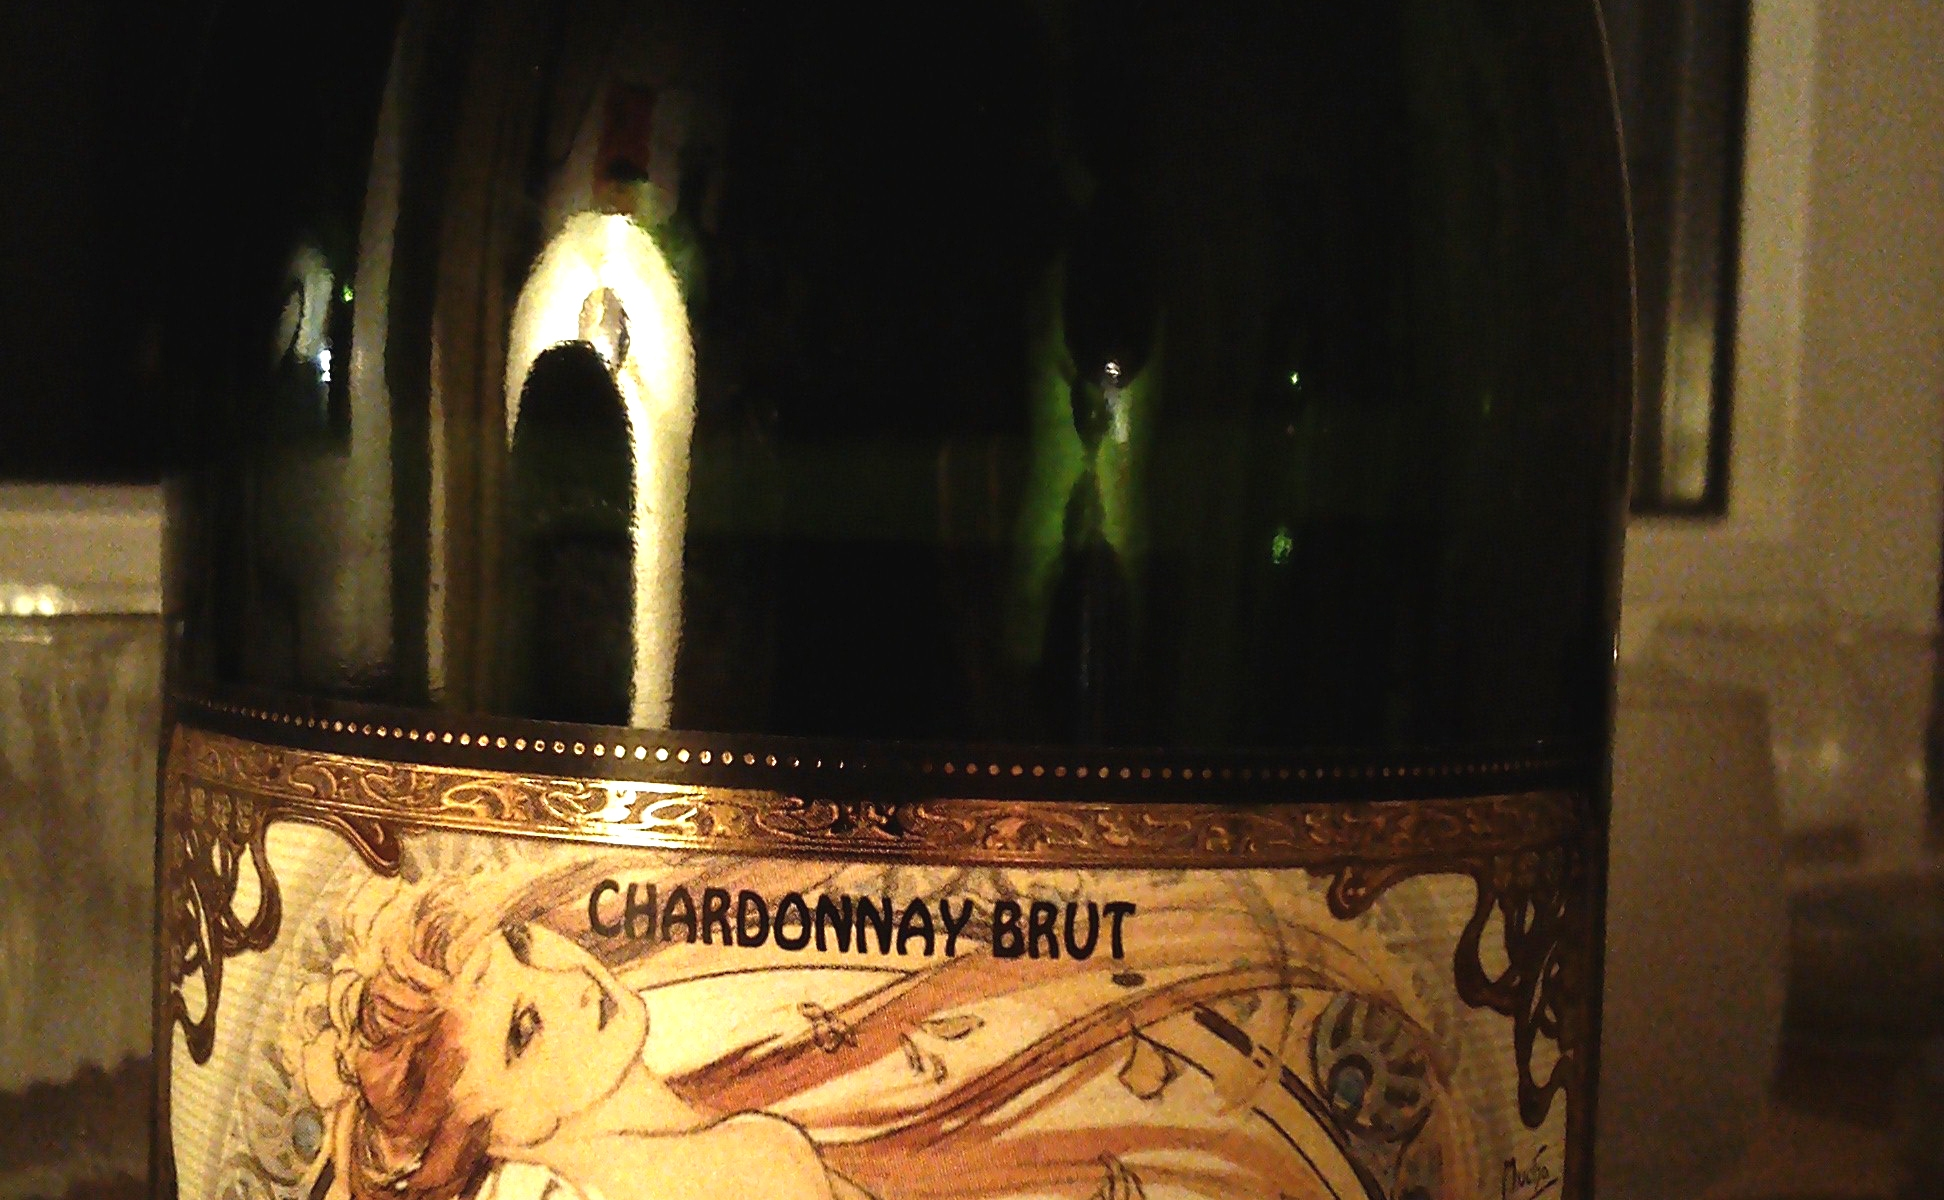 Mucha Sekt Chardonnay Brut